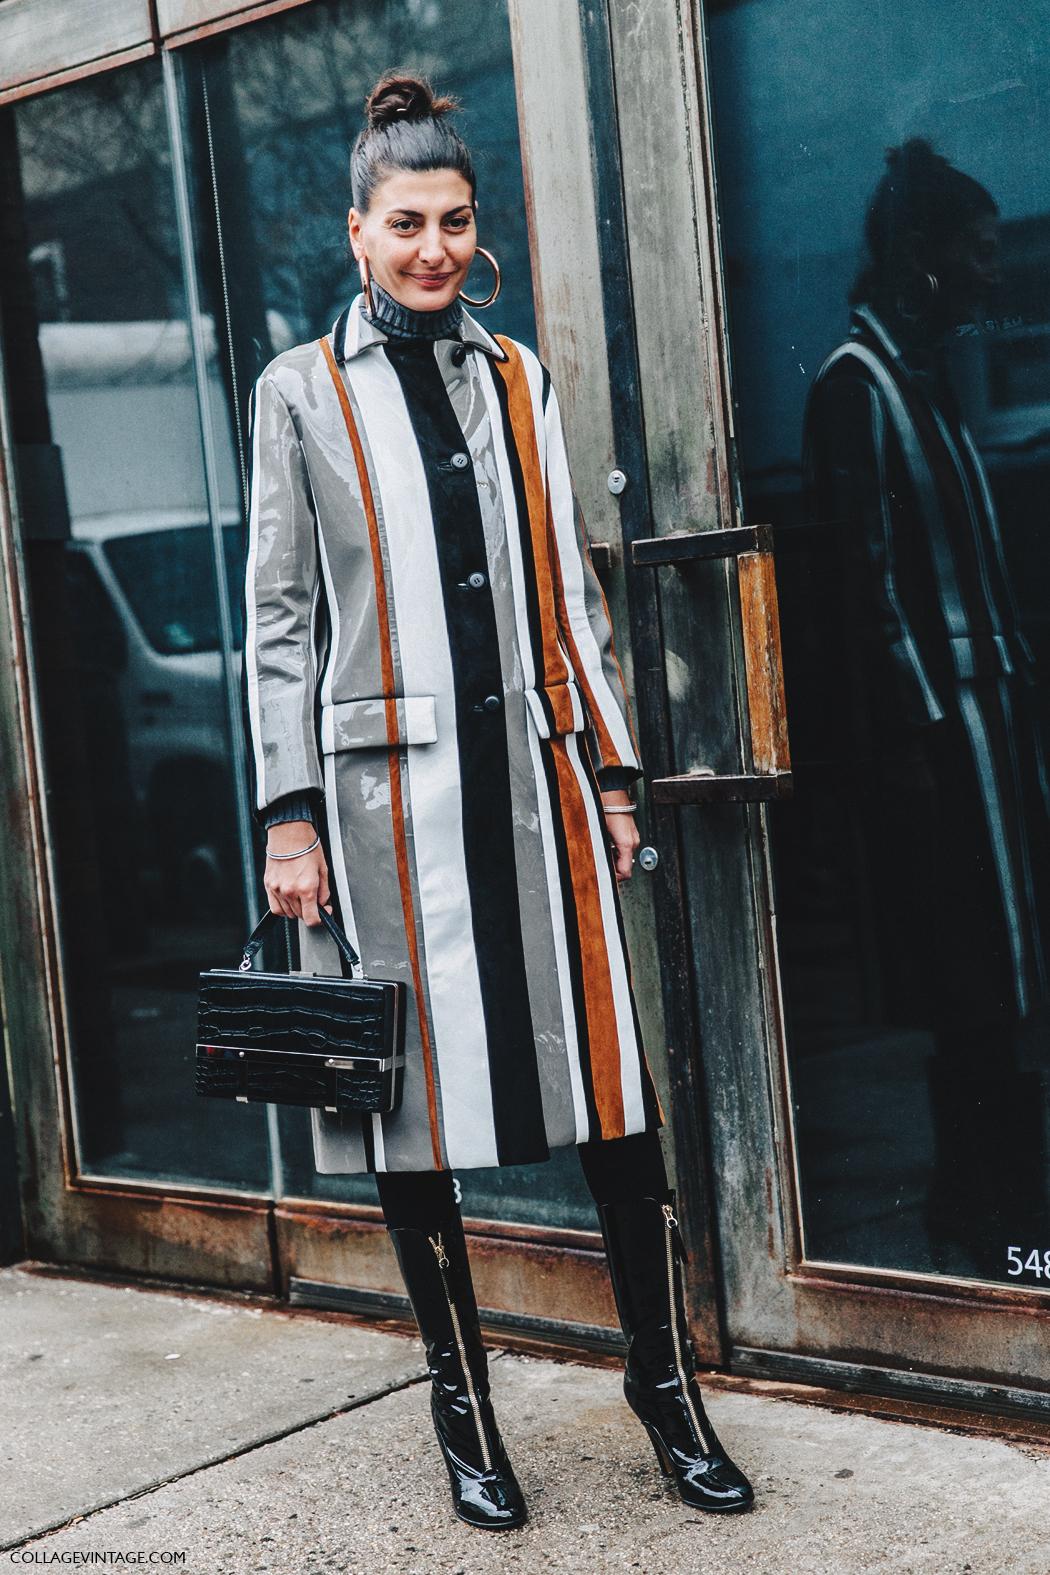 NYFW-New_York_Fashion_Week-Fall_Winter-17-Street_Style-Giovanna_Battaglia-Zipper_Boots-3